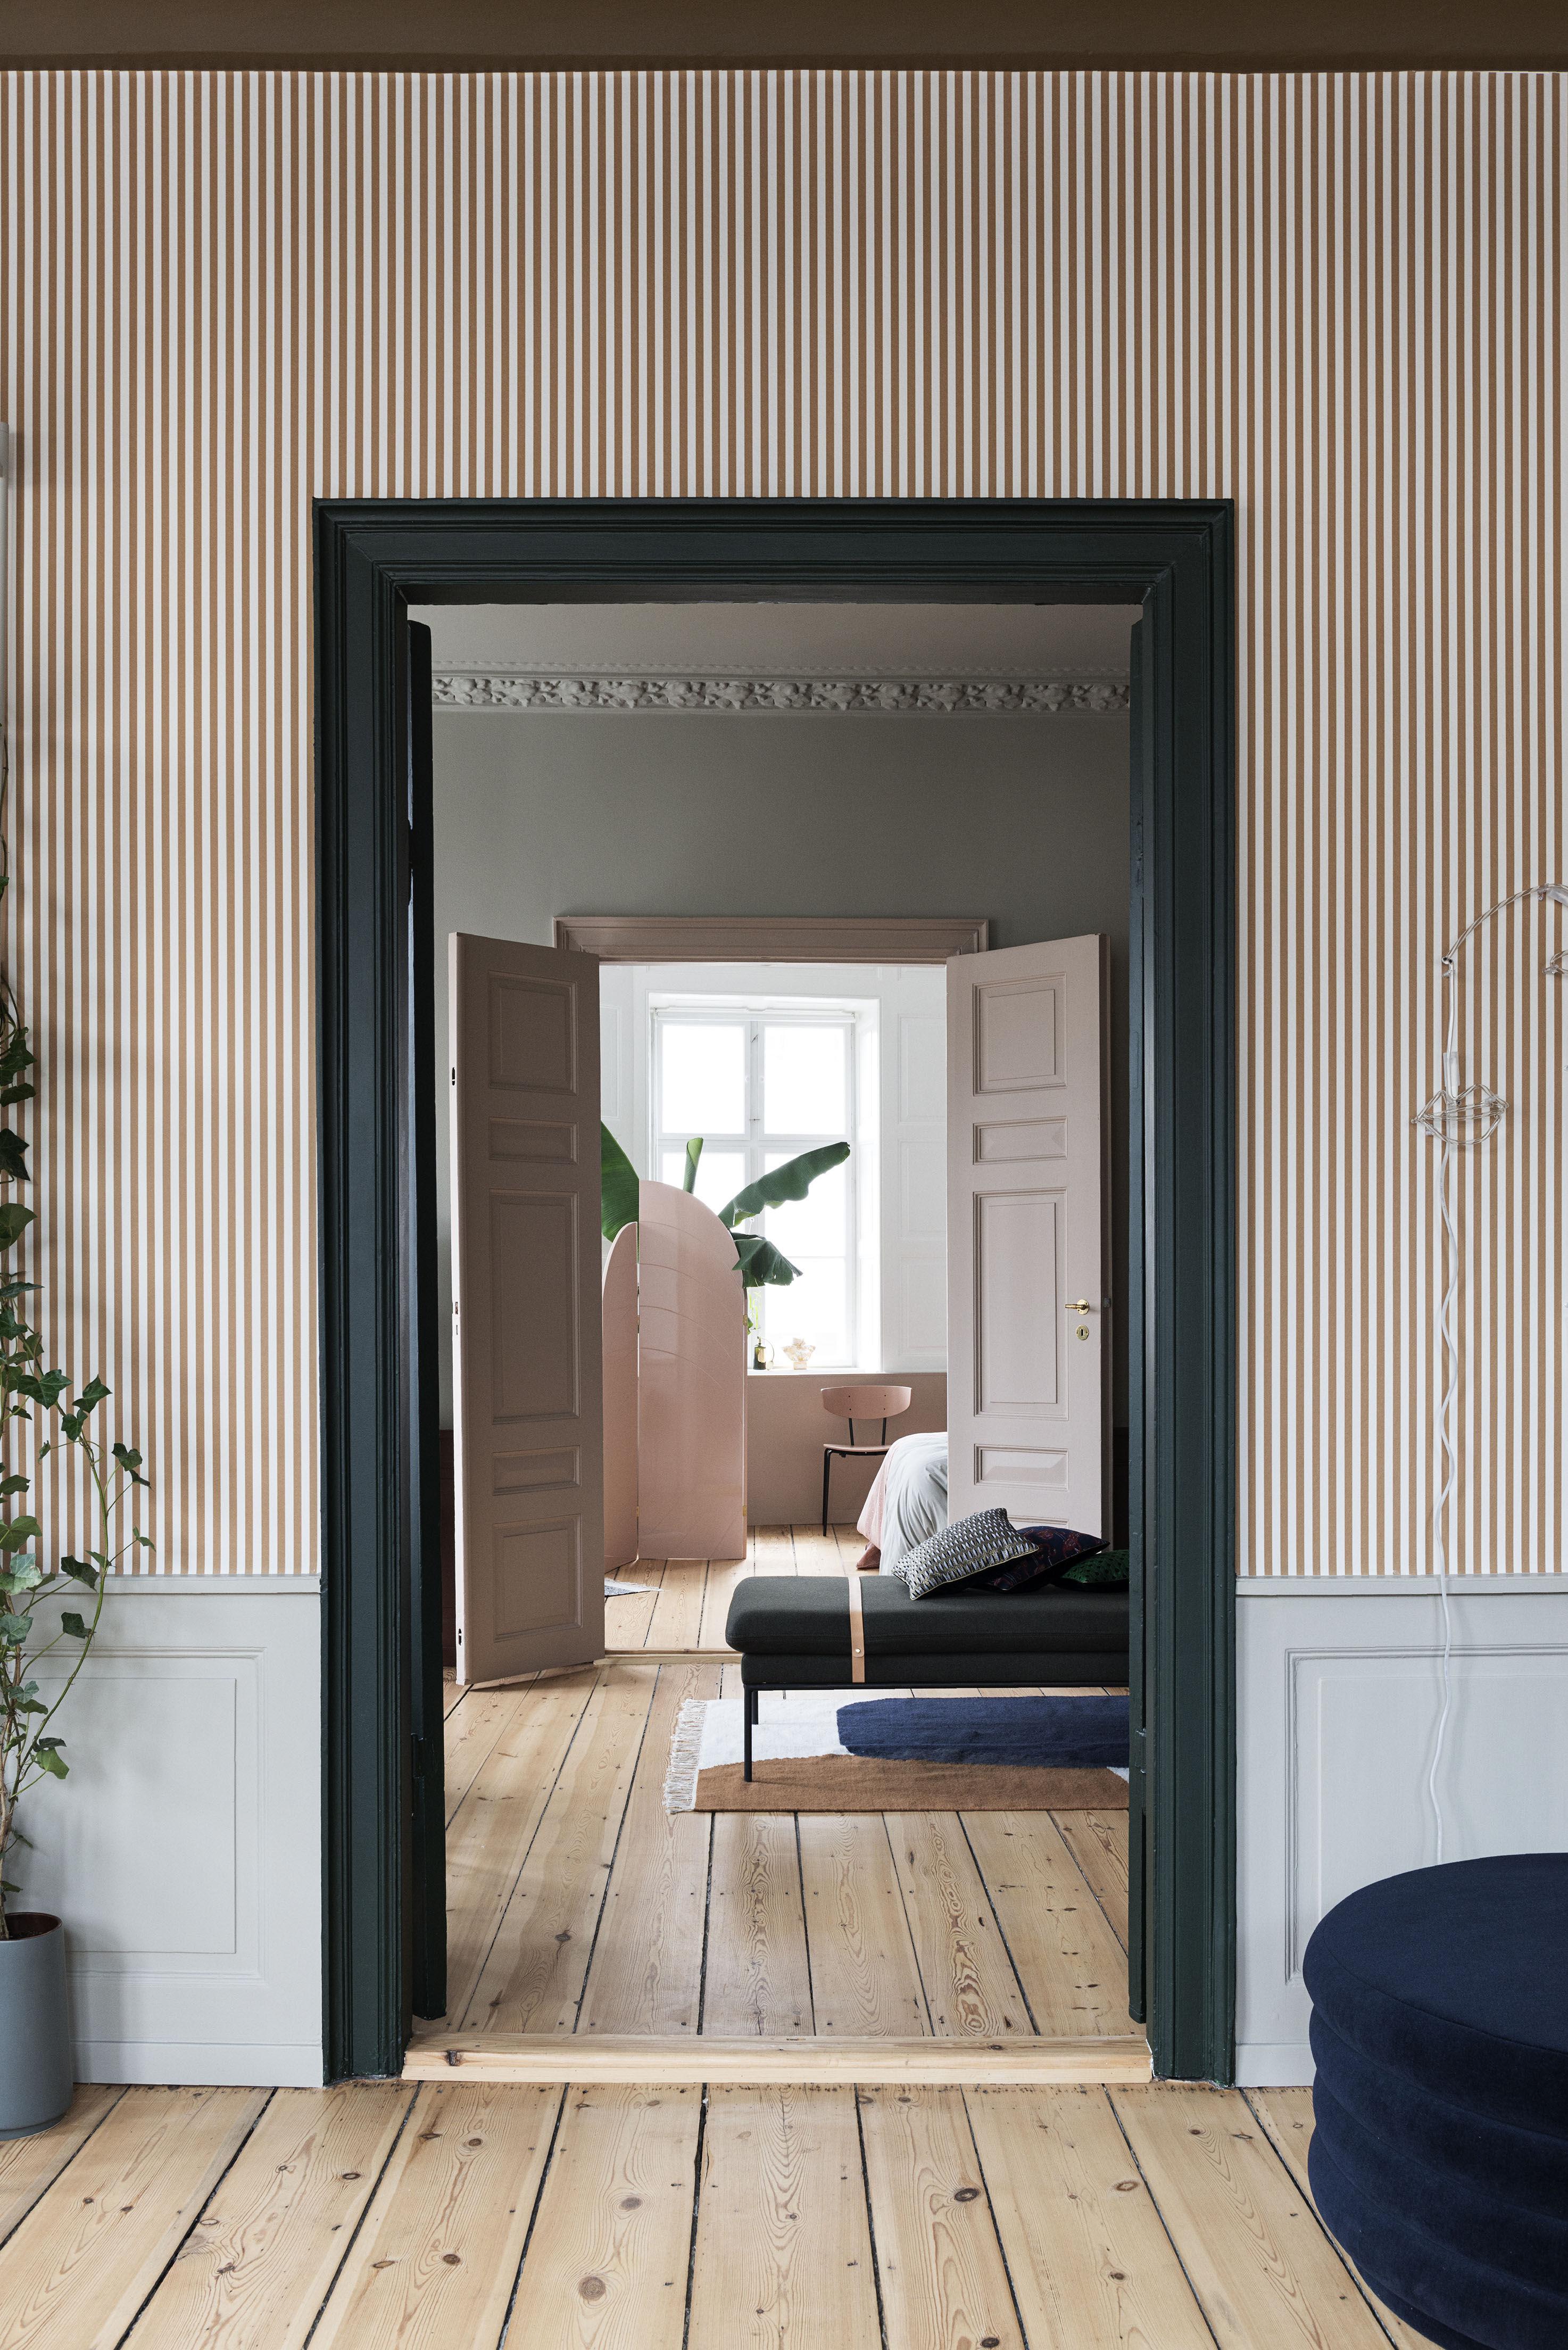 Coussin salon feuille ferm living or gris noir made in design - Coussin salon ...